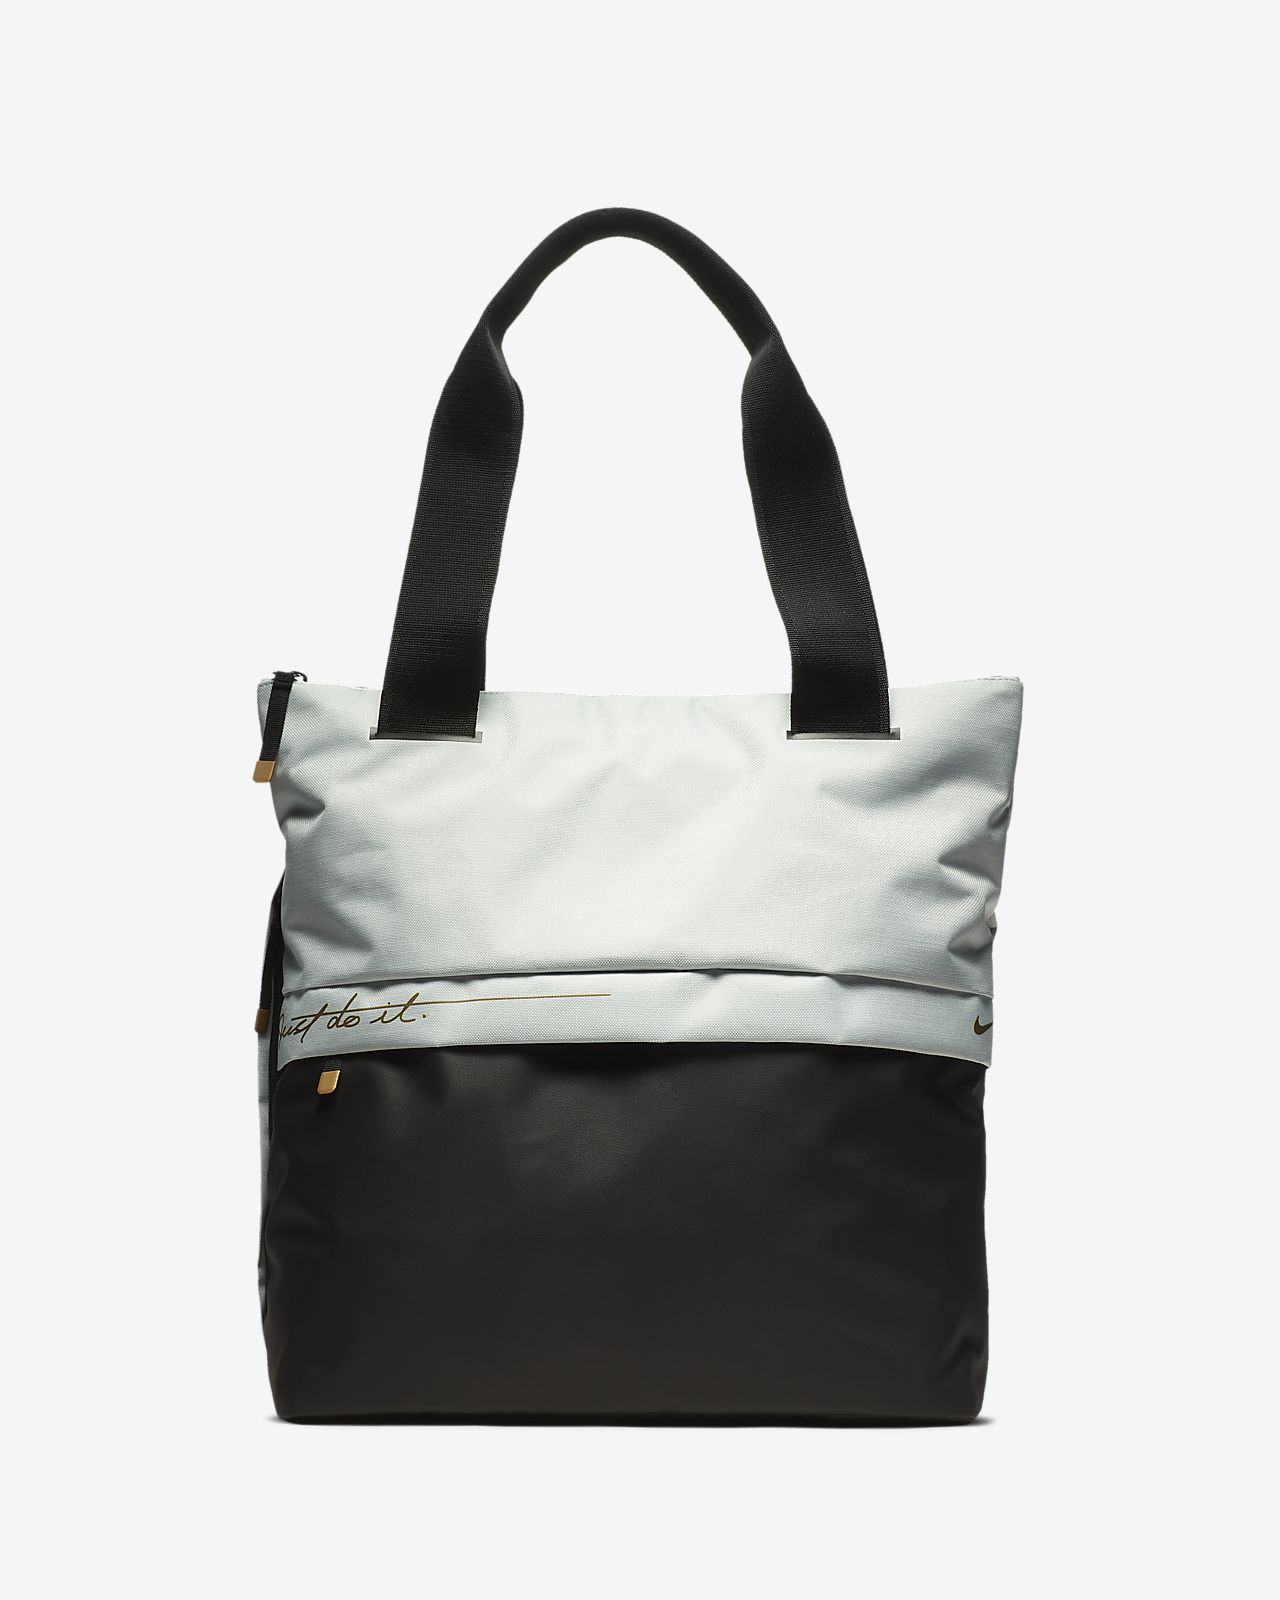 Nike Radiate Women S Graphic Training Tote Bag